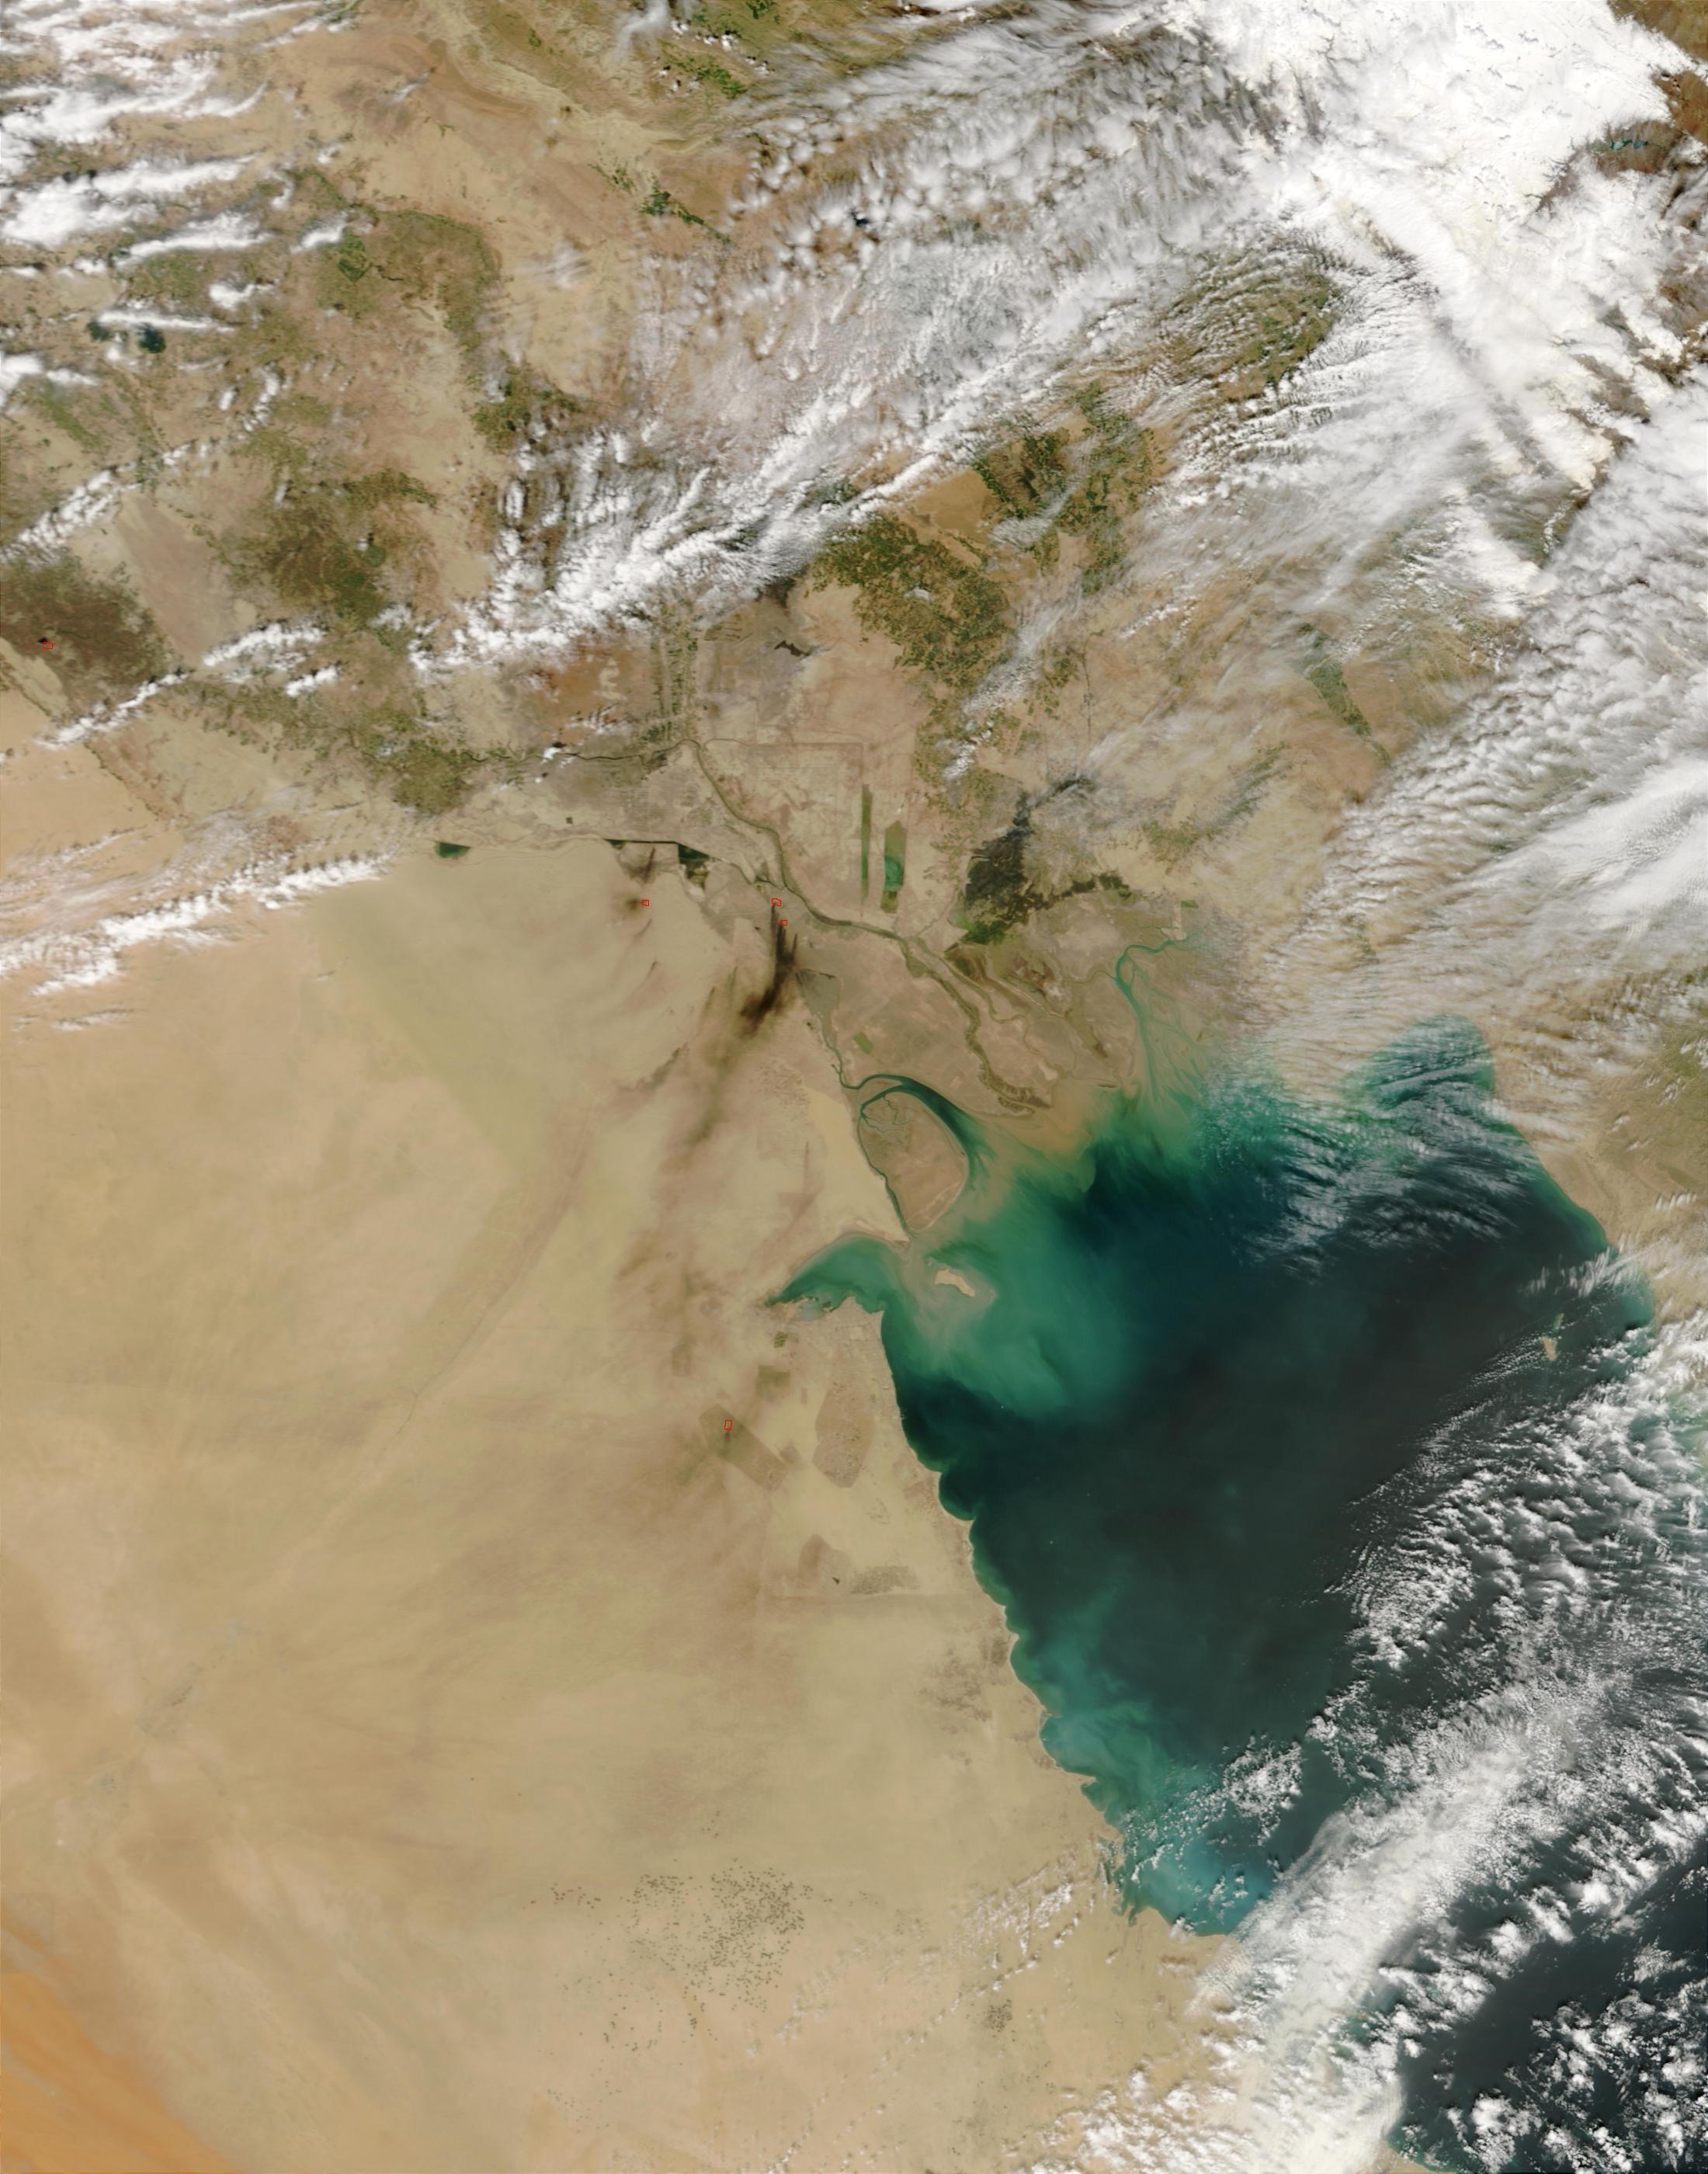 Pozos petroleros quemando en Iraq meridional (seguimiento satelital de la mañana)